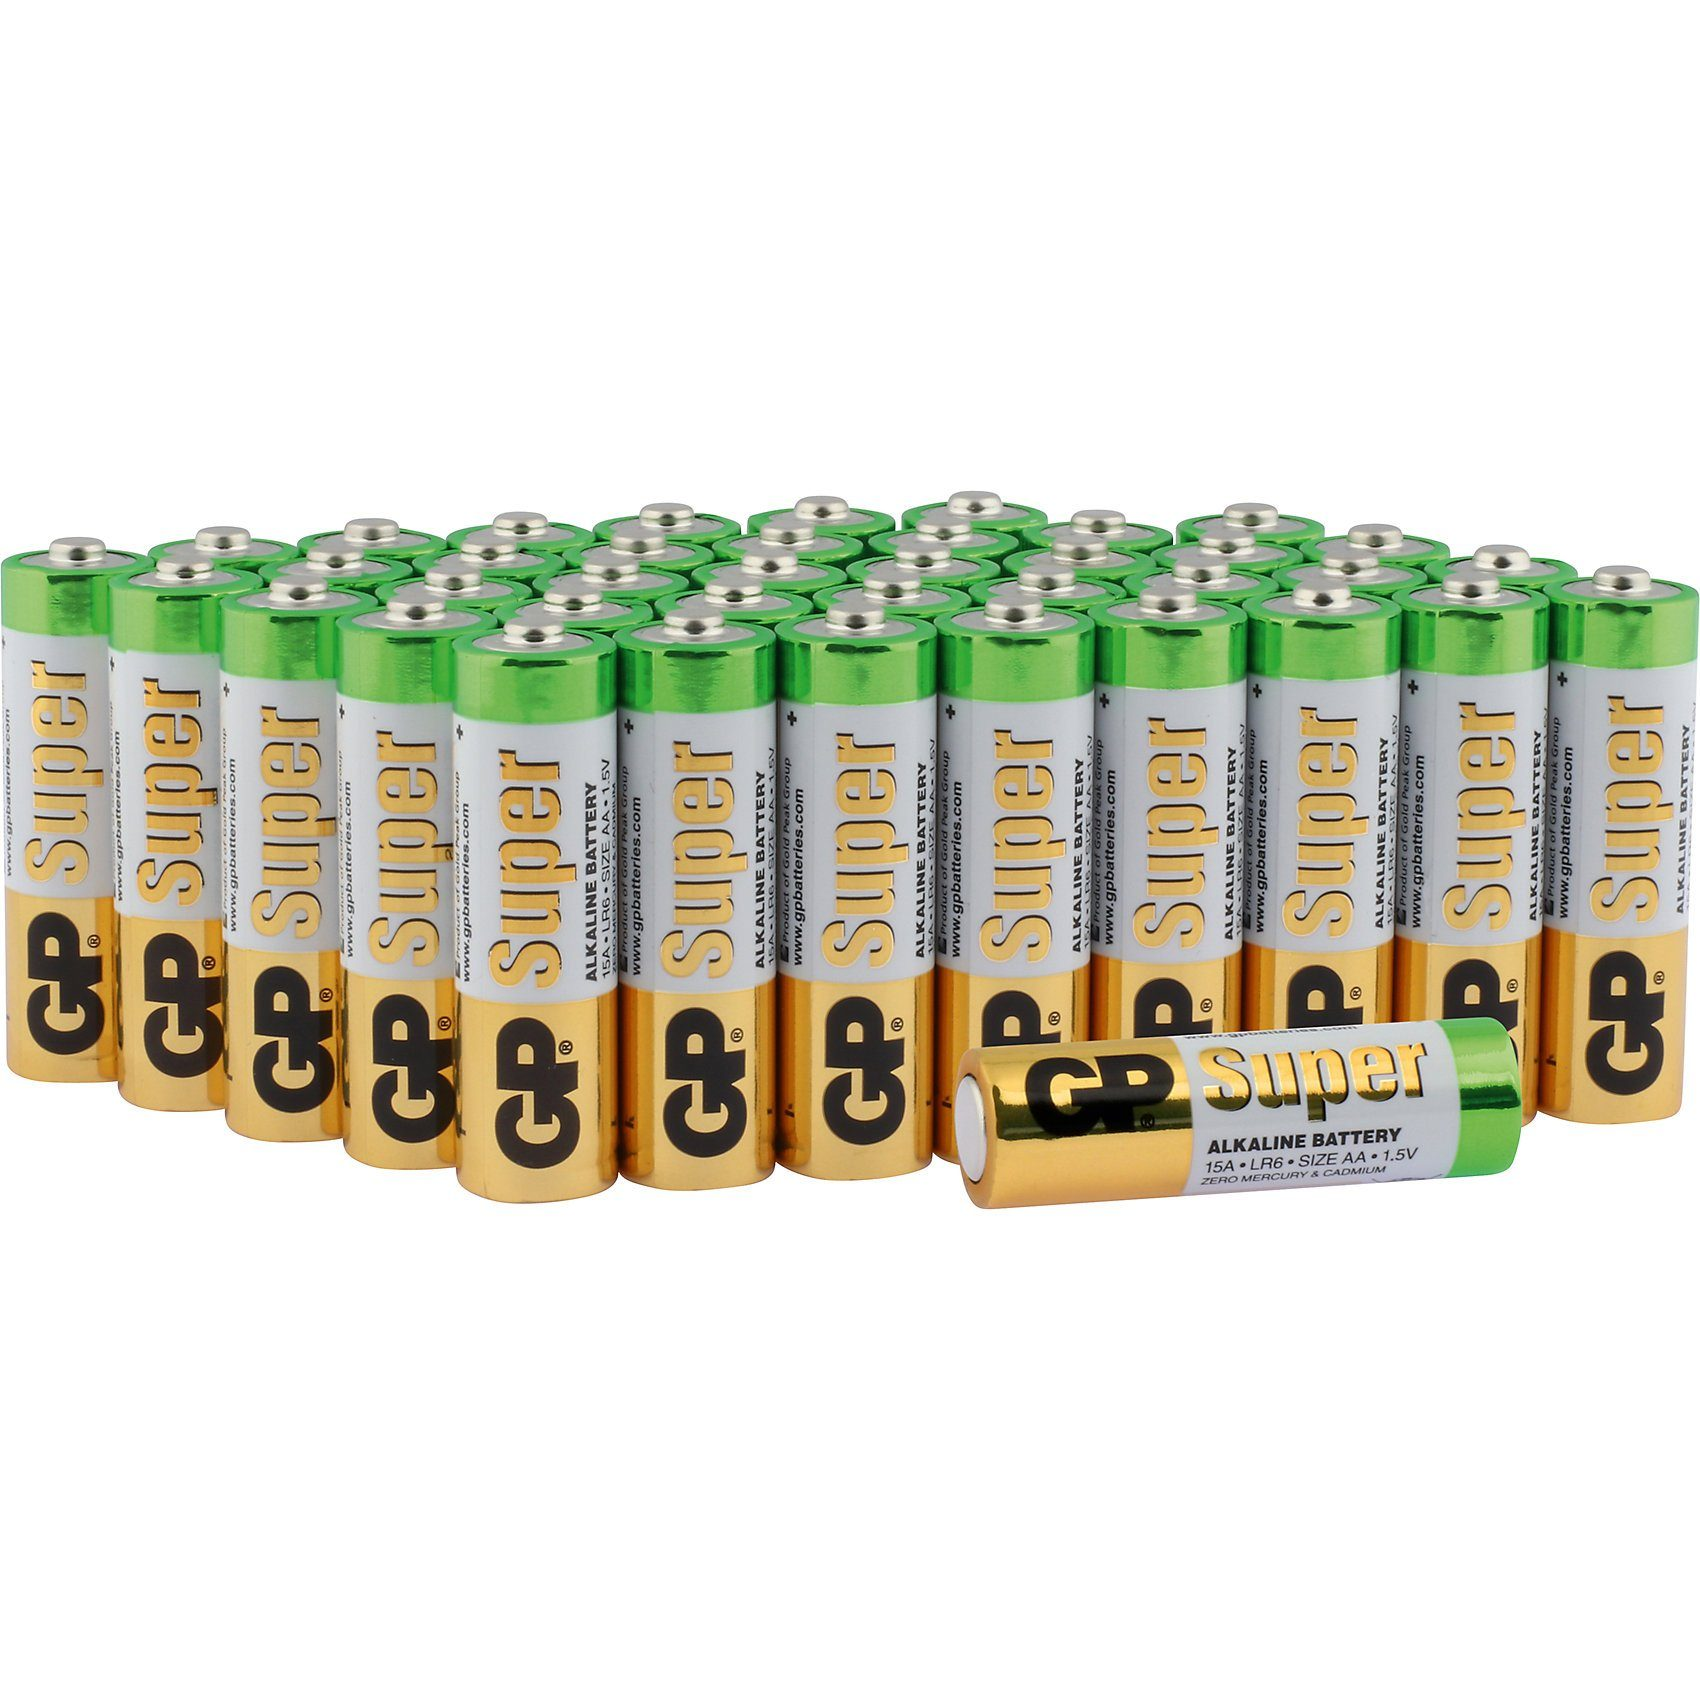 Alkaline Batterien Multipack AA, Mignon, LR 06 (40er Pack)